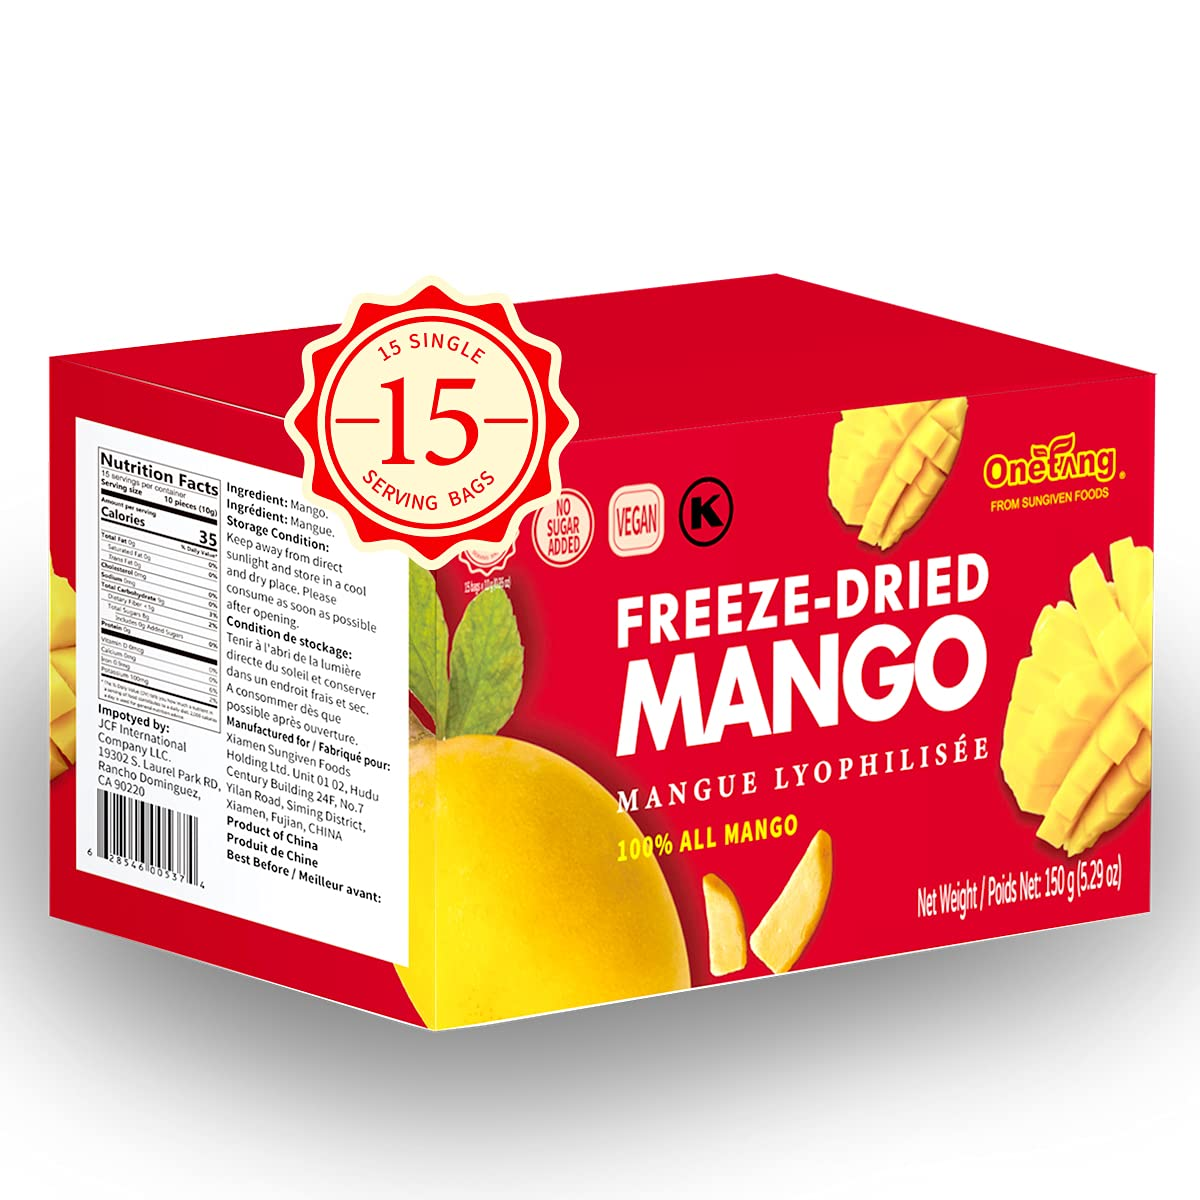 ONETANG Freeze-Dried Fruit Mango, 15 Pack Single-Serve Pack, Non GMO, Kosher, No Add Sugar, Gluten free, Vegan, Healthy Snack 0.52 Ounce